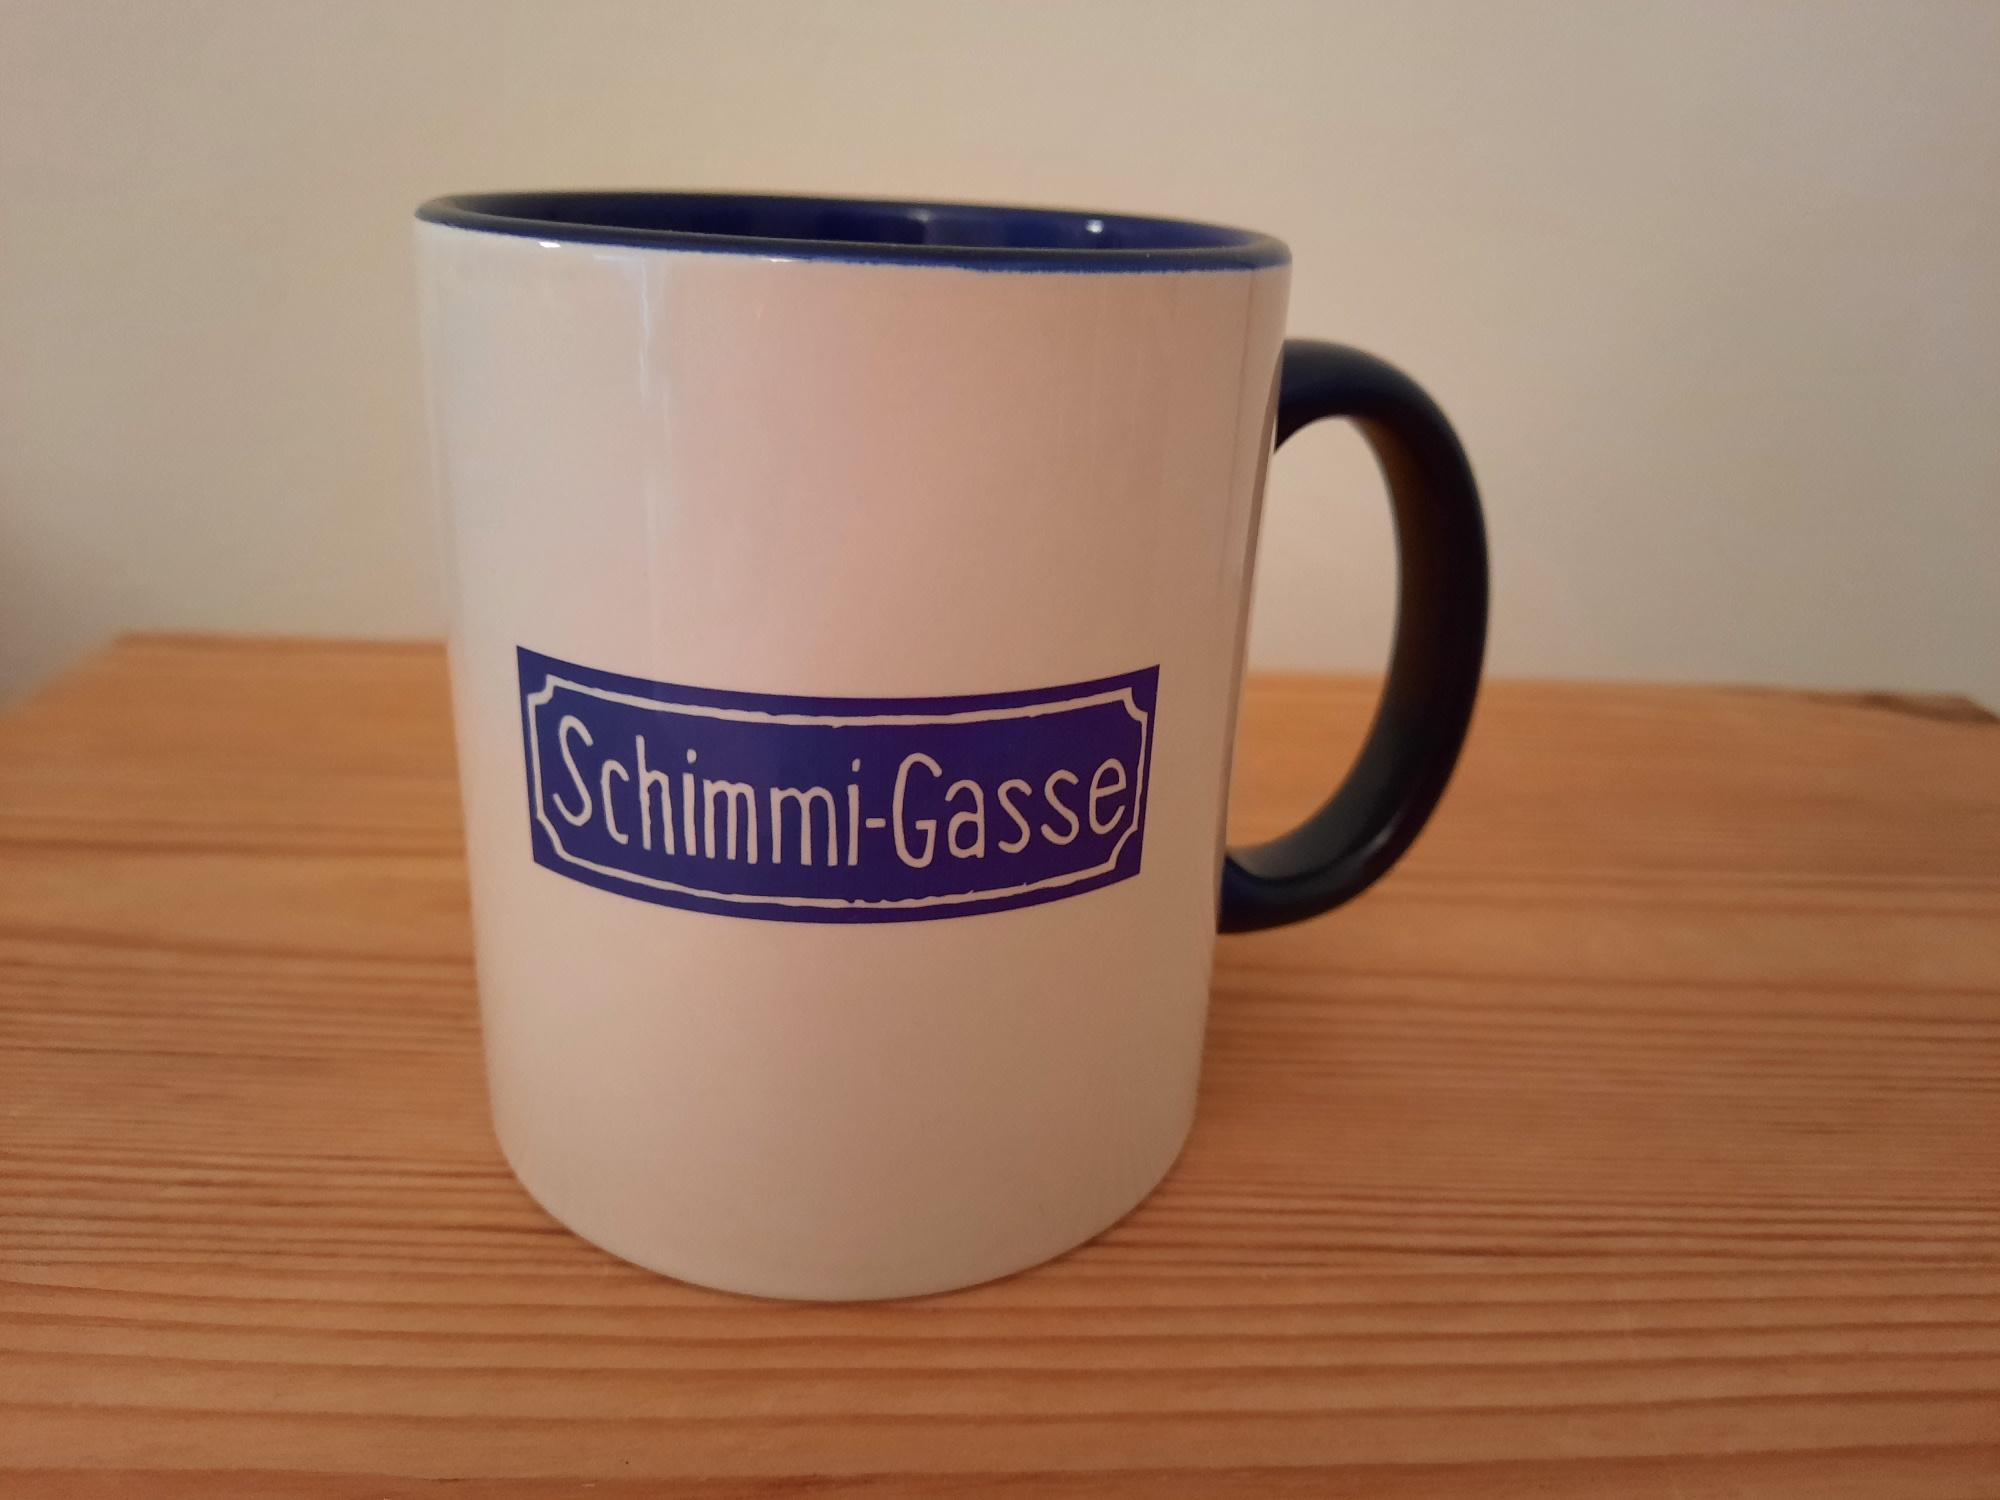 Kaffeetasse Schimmi-Gasse